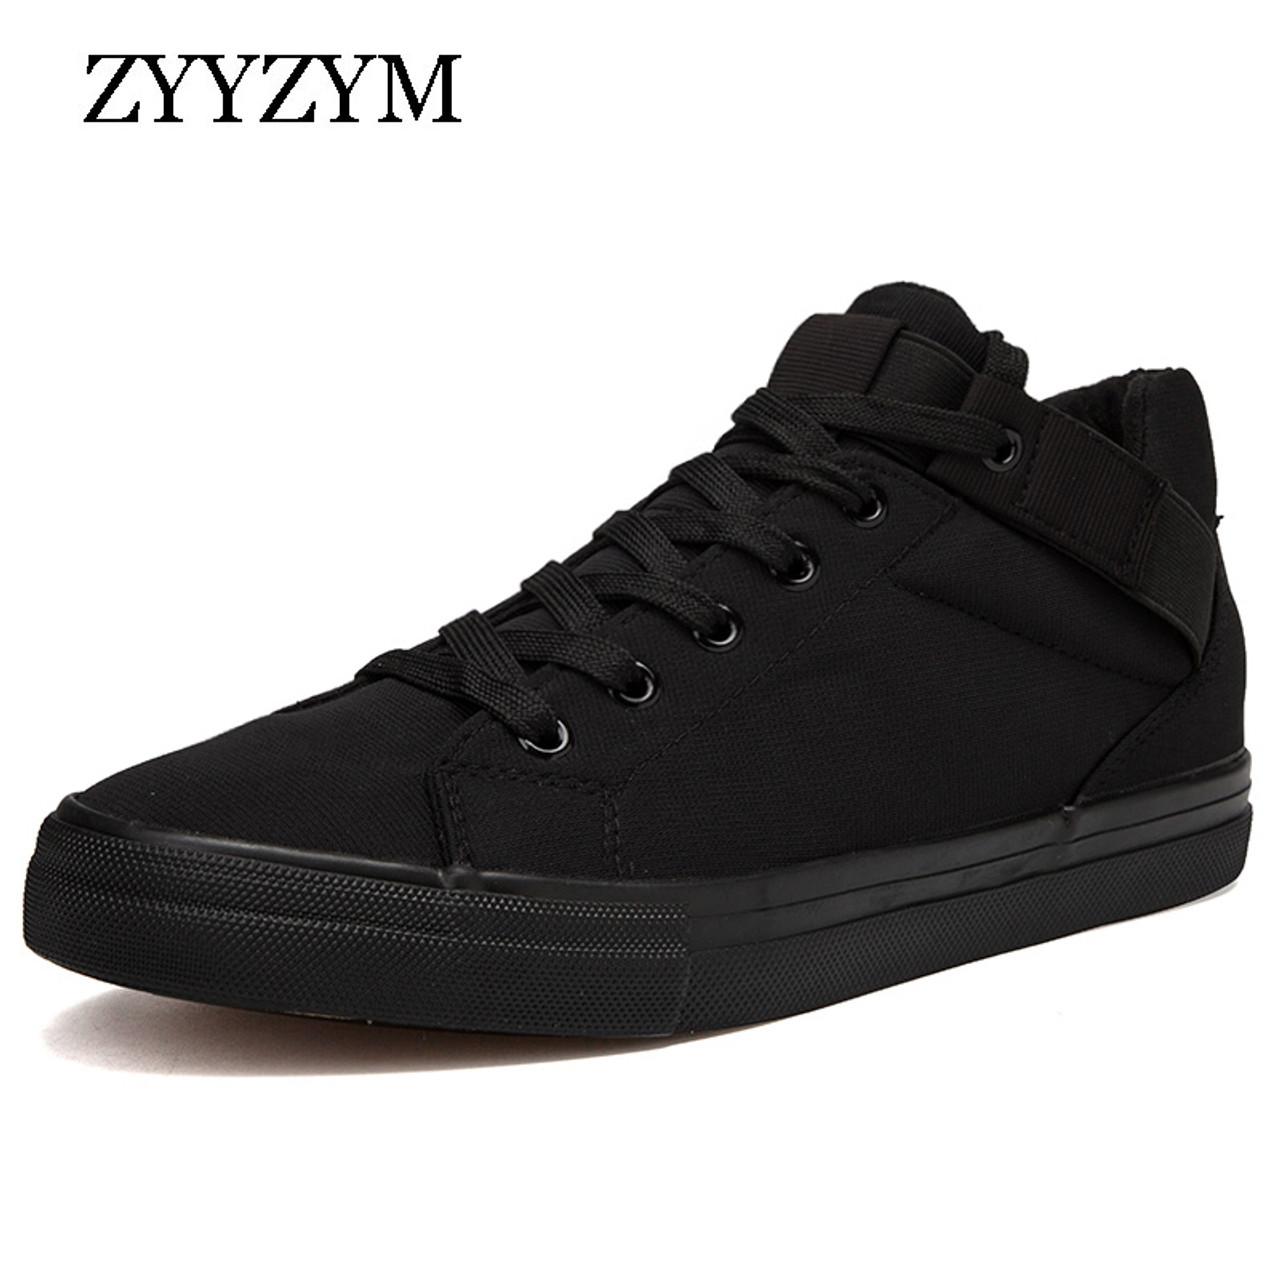 ZYYZYM Men Shoes Spring Autumn New